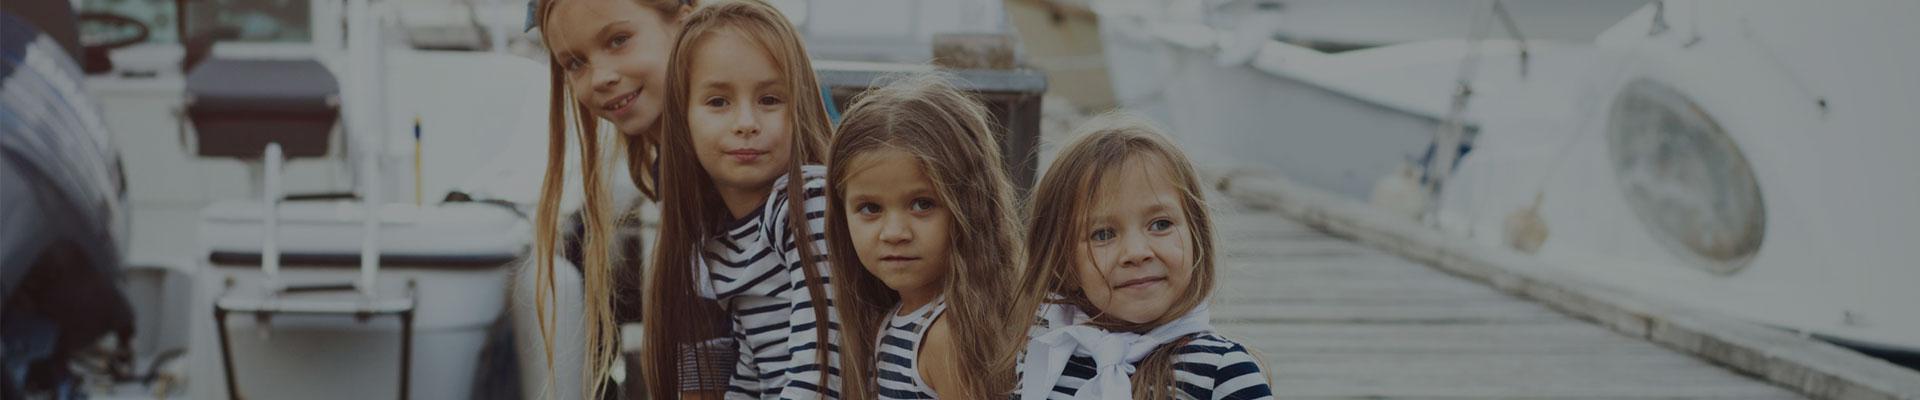 Mädchen - Pantau Kindermode e.K.